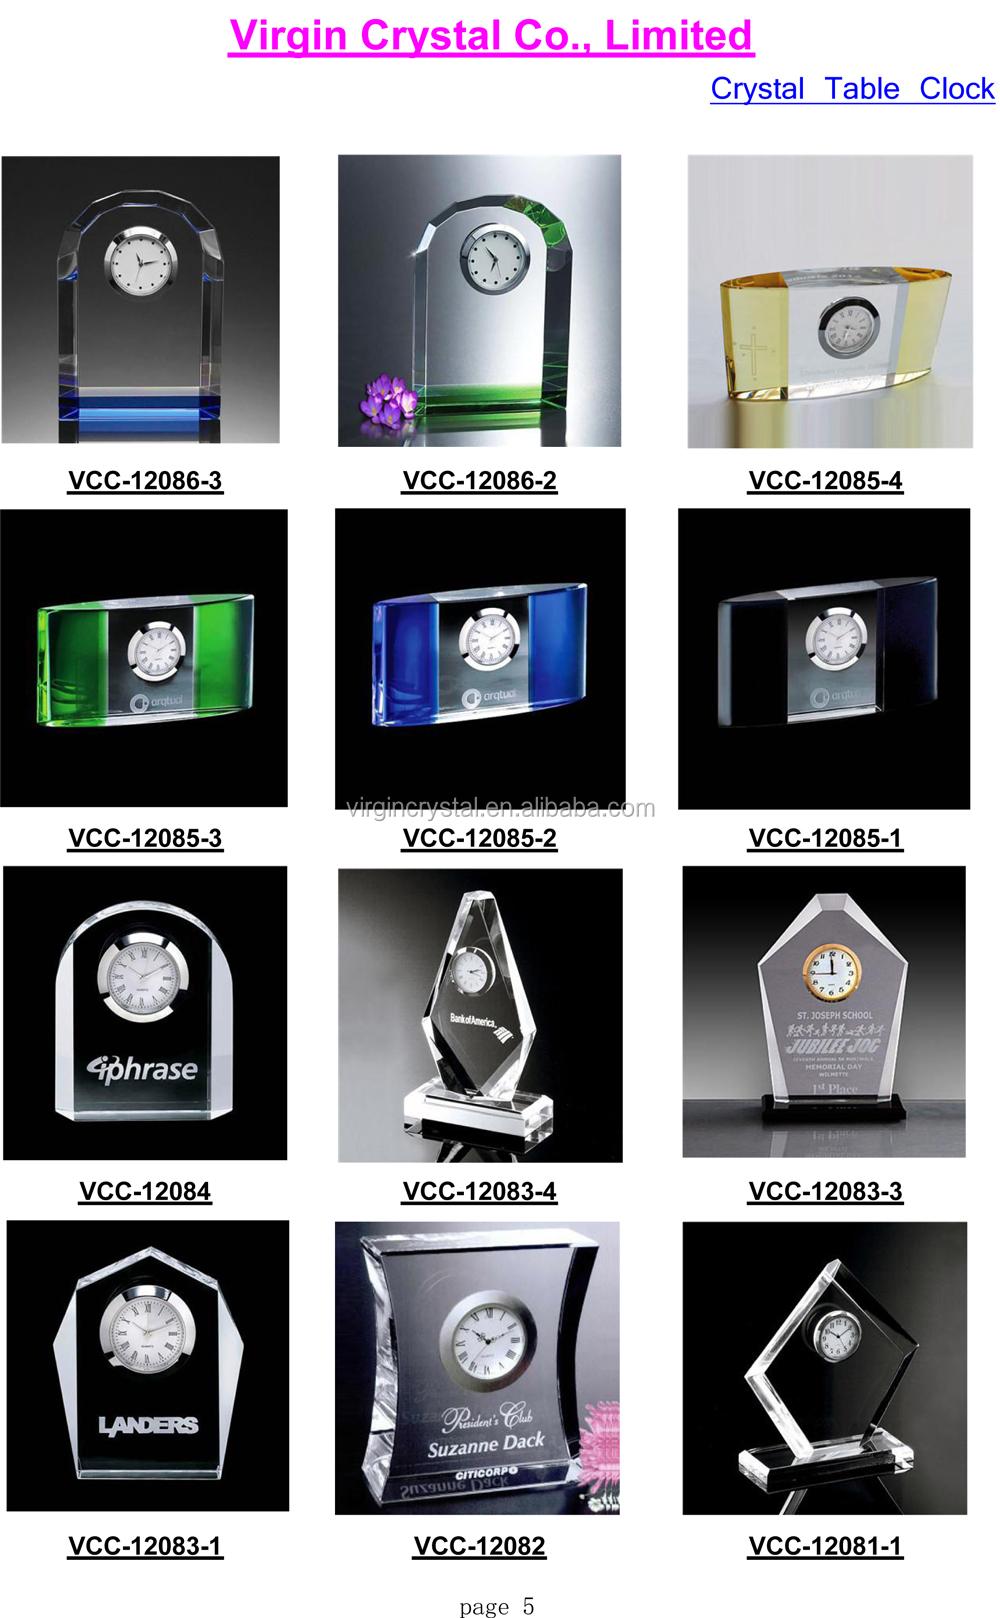 2016 Crystal Table Clock and Mechanical clock Catalog-5.jpg